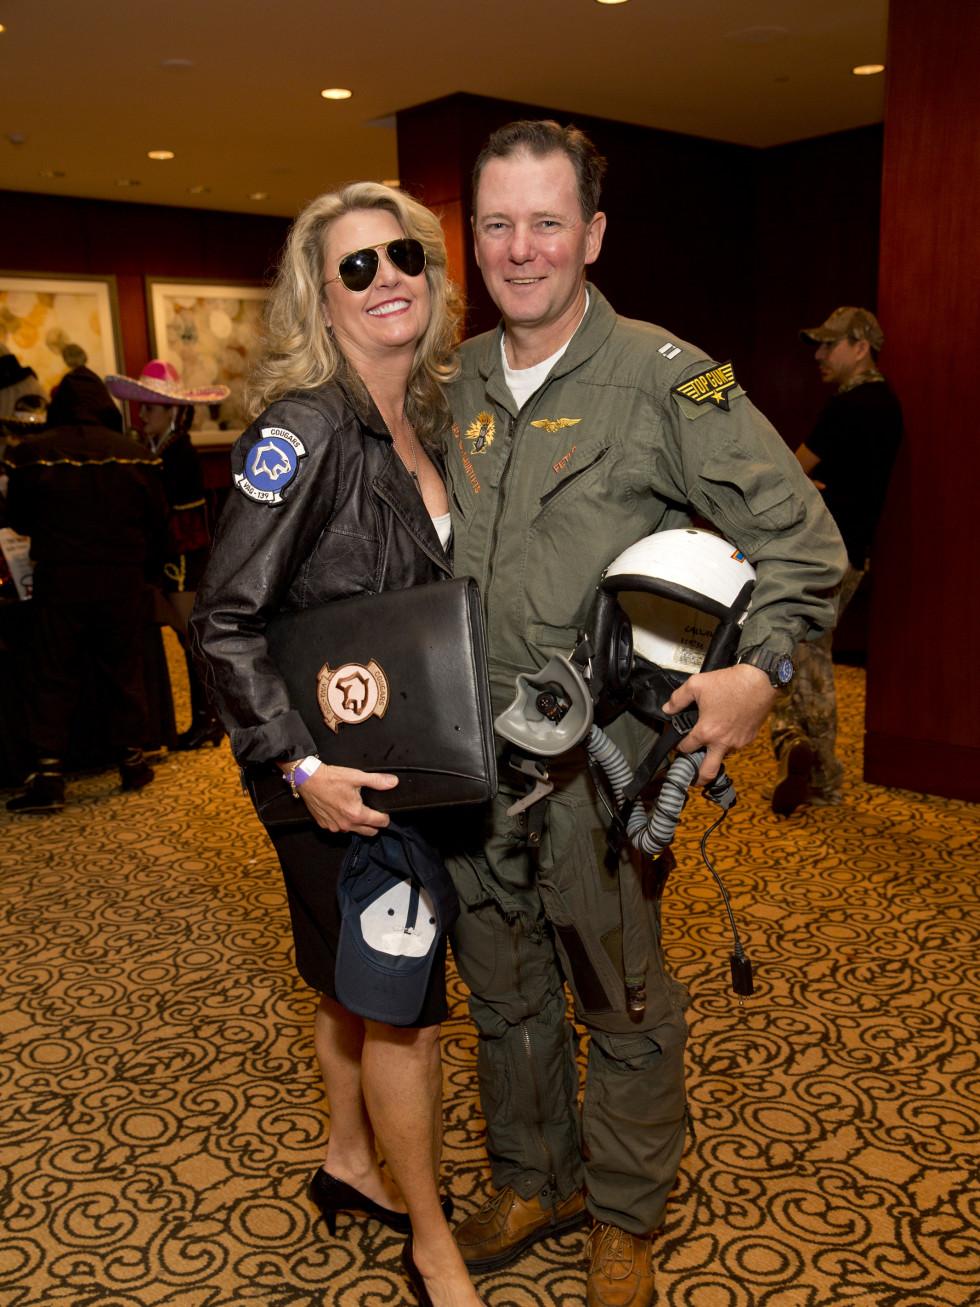 News, Shelby, Easter Seals The Bash, Oct. 2015, Tammy Shepperd, Shane Shepperd